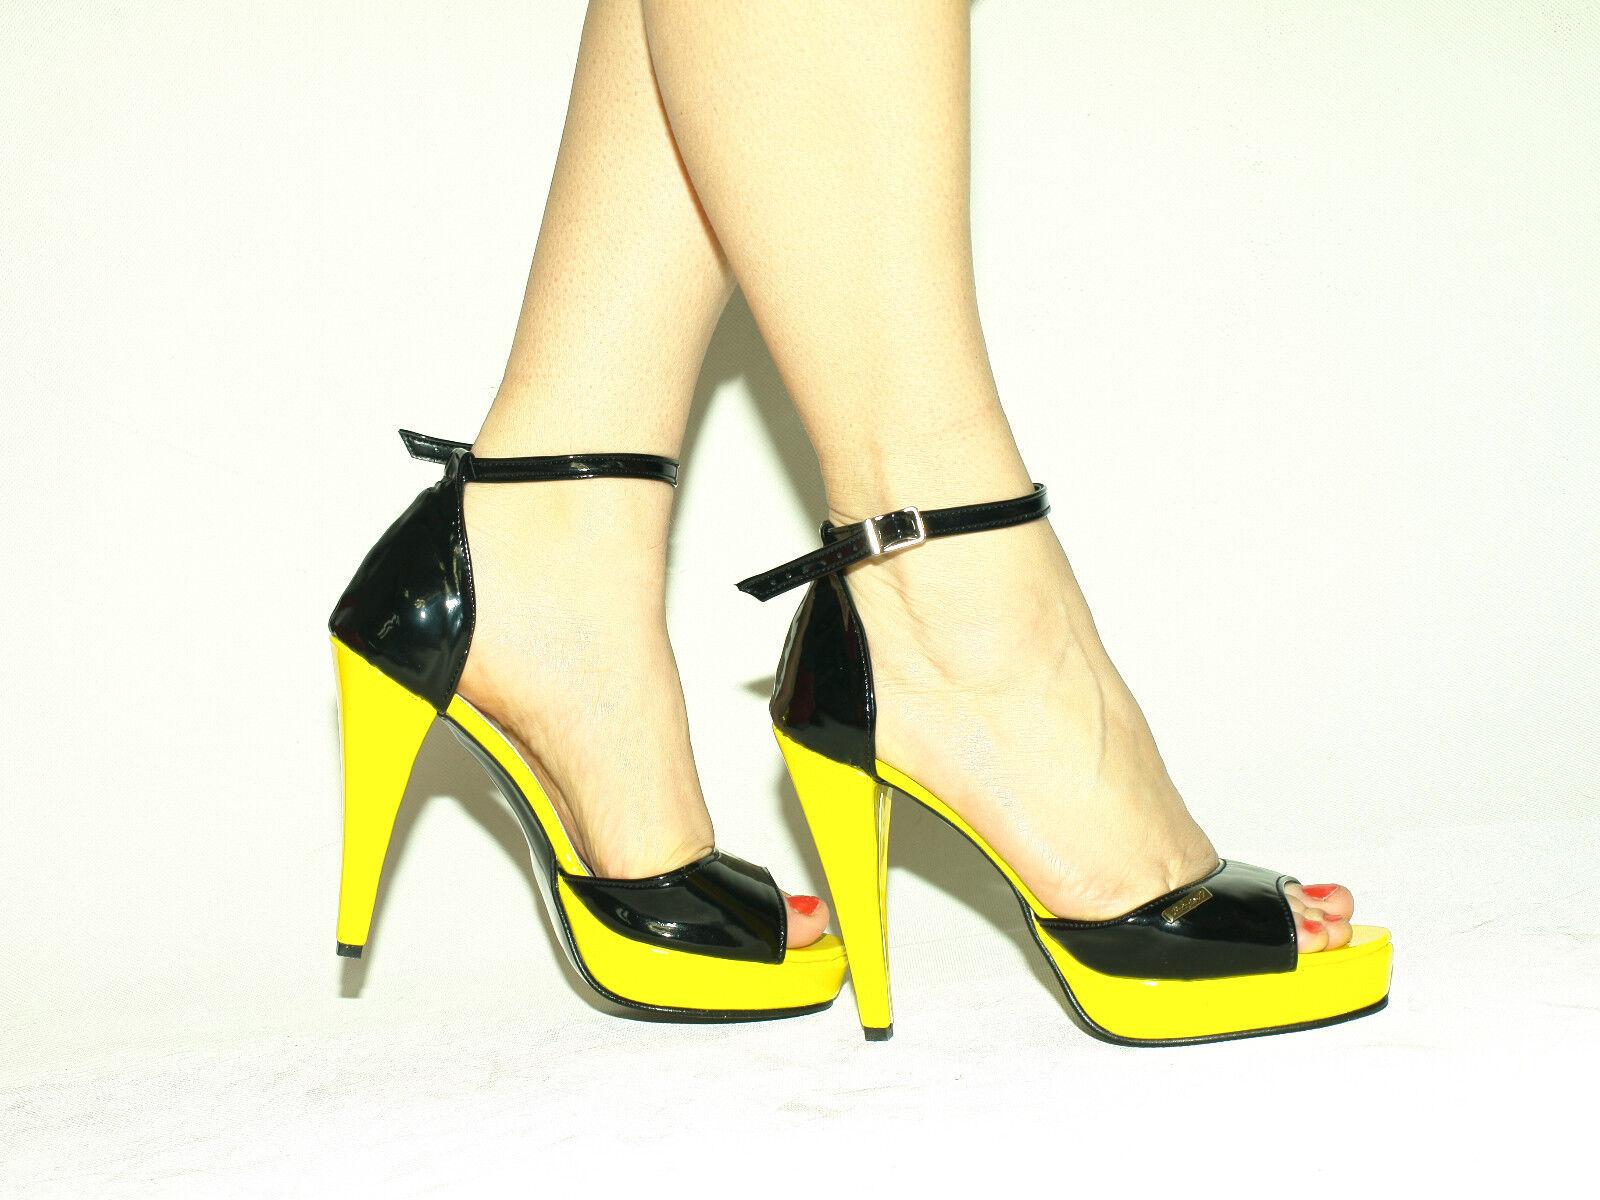 Pumps  37 38 39 40 41 42 43 44 45 46 47 Bolingier-Poland heels 13cm FS1309